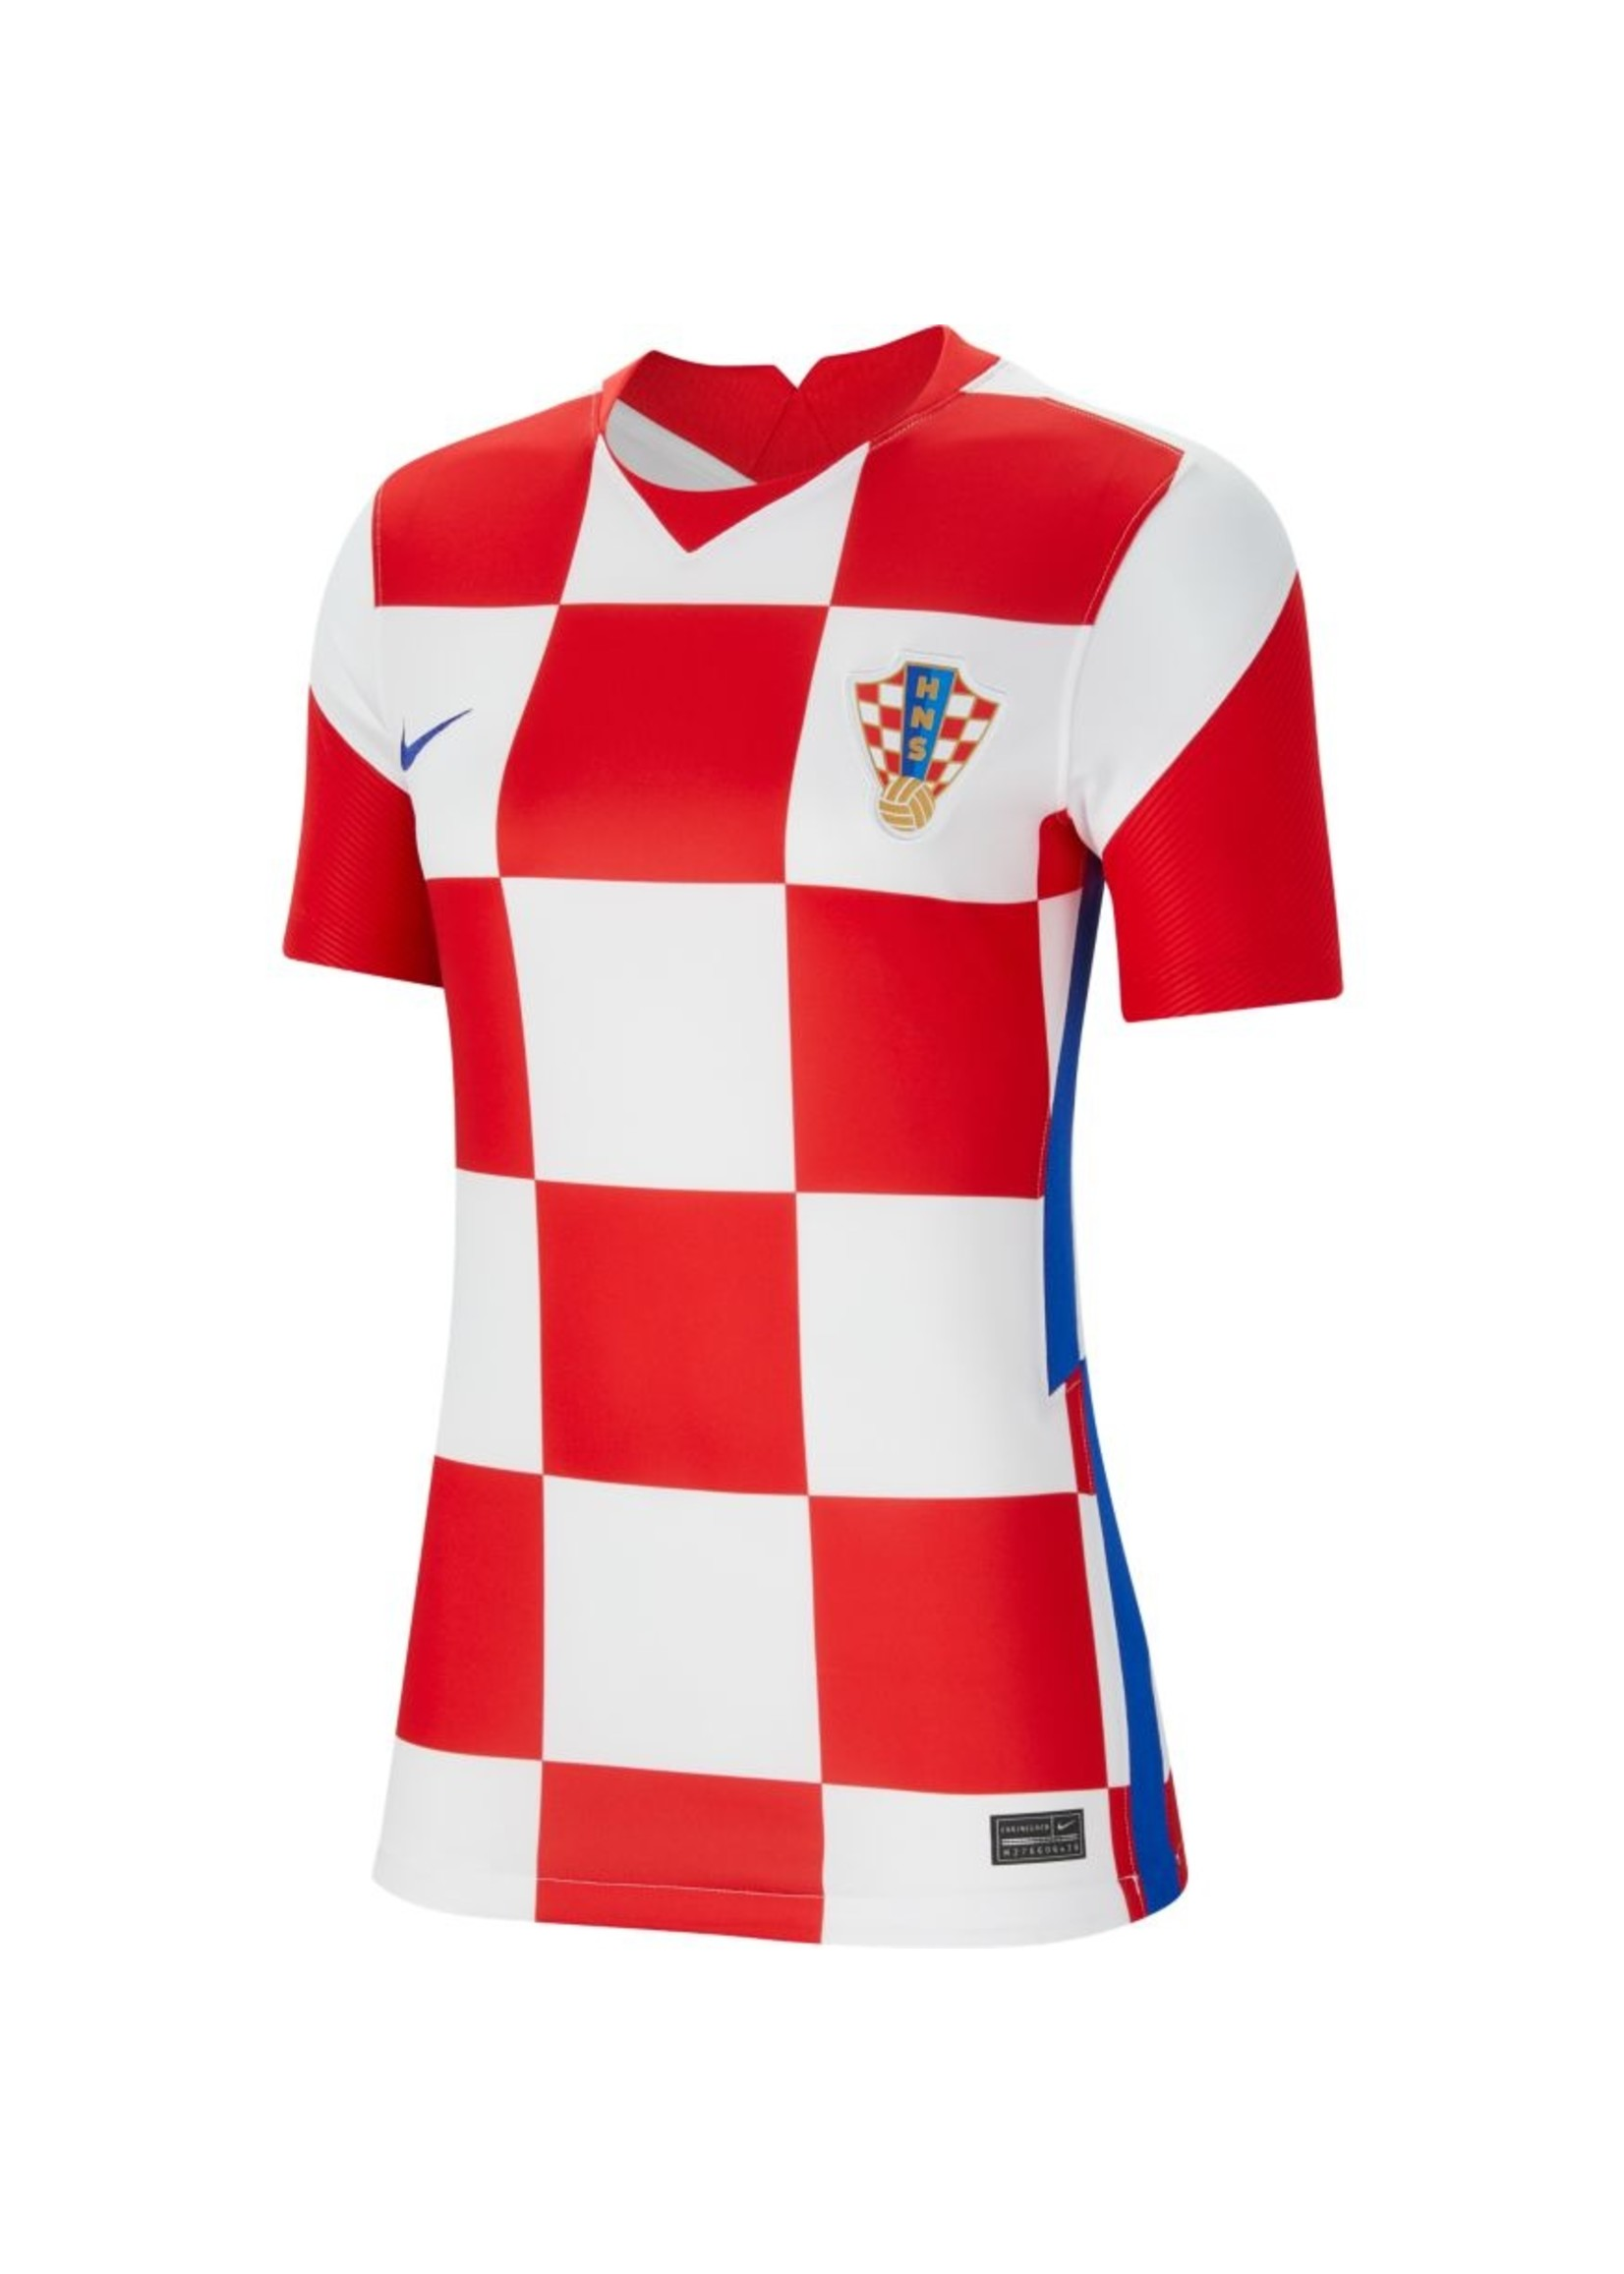 Nike Croatia 20/21 Home Jersey Womens